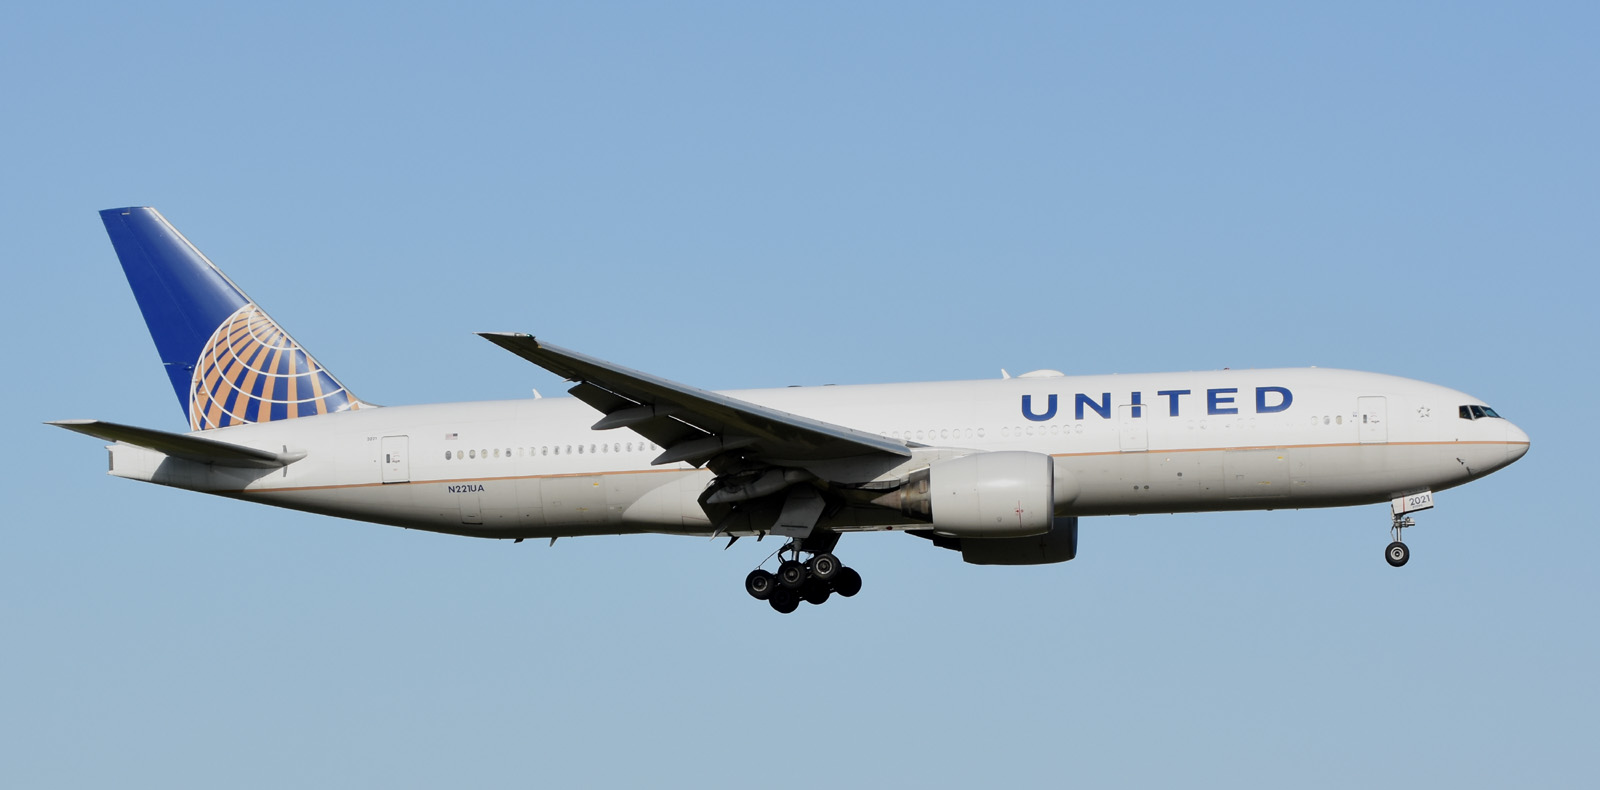 United160417g227